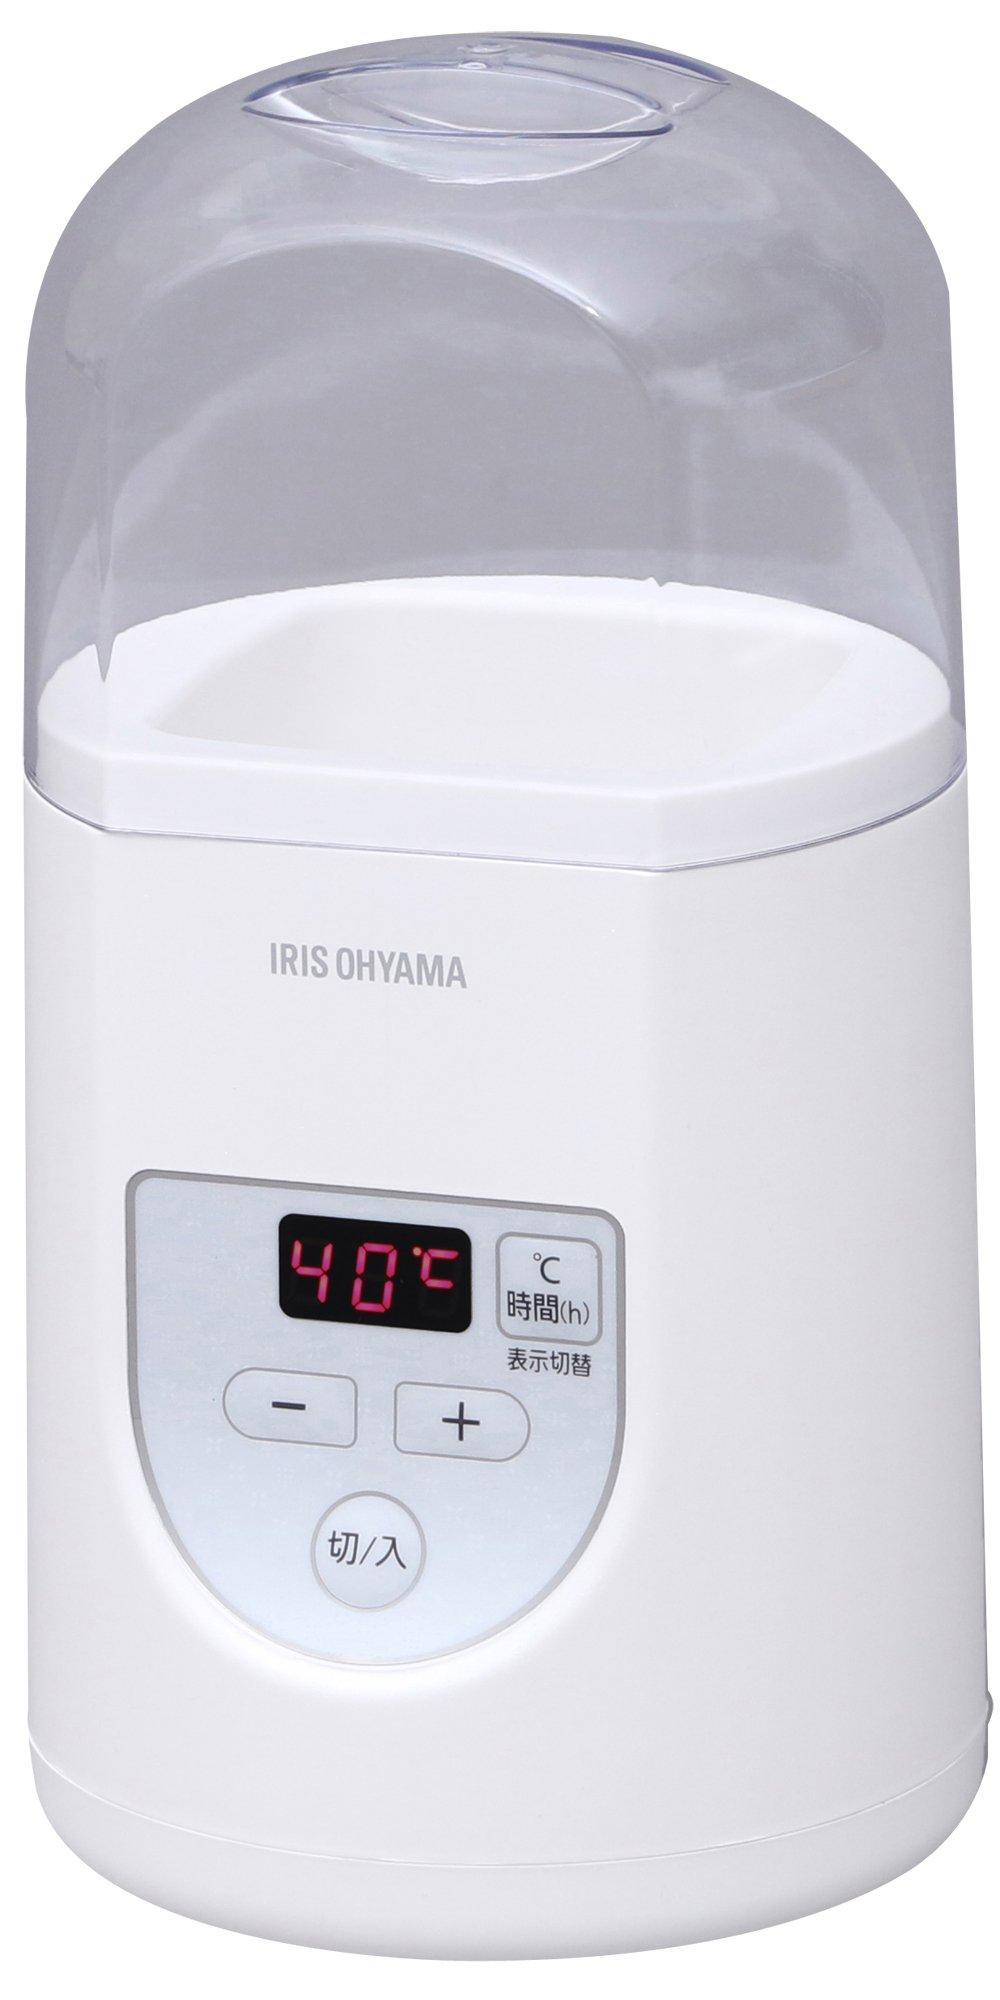 IRIS OHYAMA yogurt maker Premium (with temperature control function) IYM-012-W by IRIS OHYAMA, Inc.